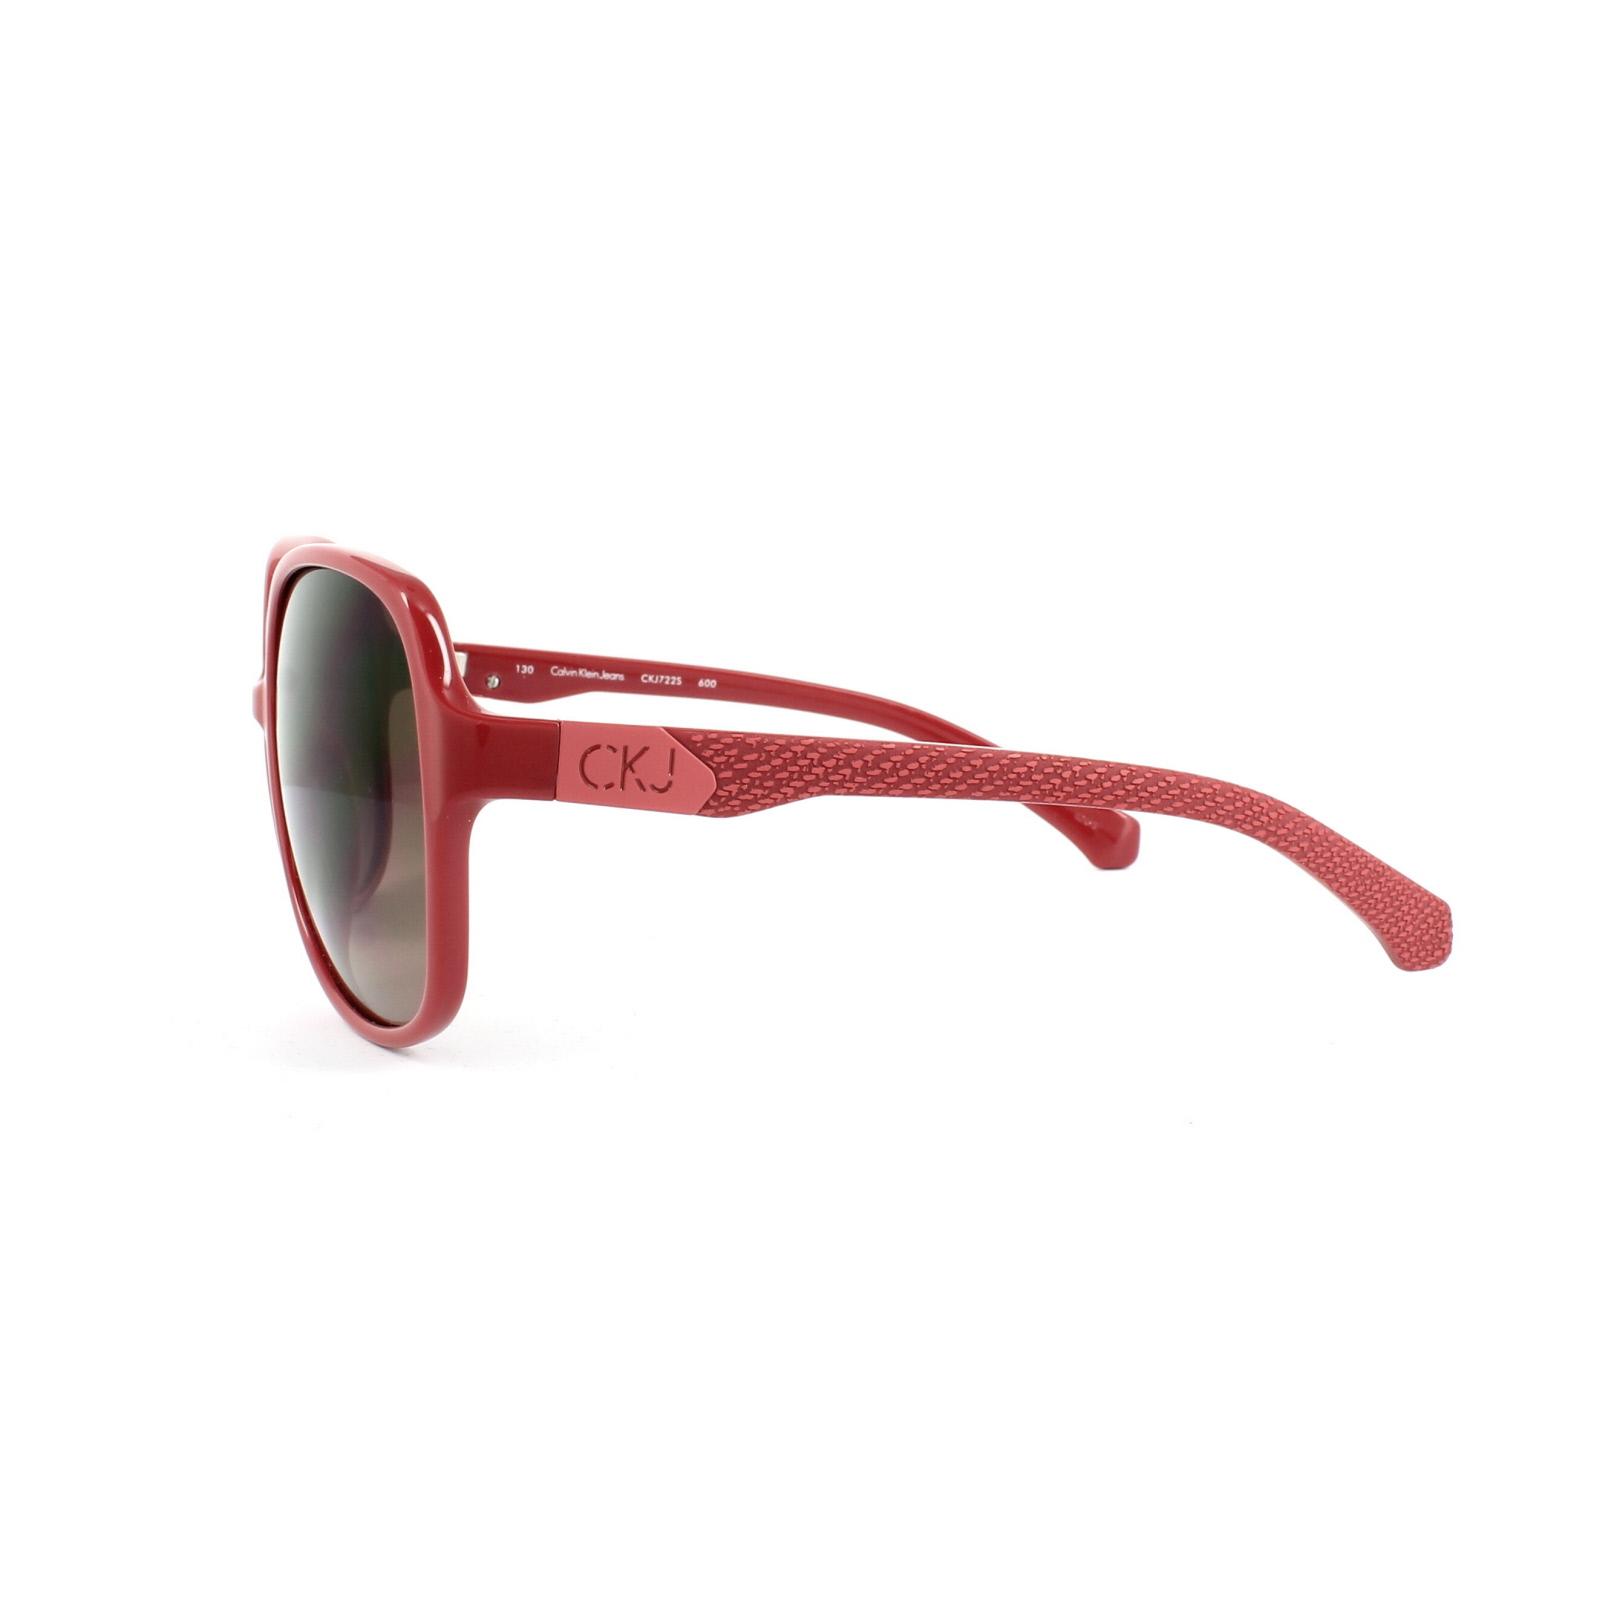 7d6b68b2f7c Sentinel Calvin Klein Jeans Sunglasses CKJ722S 600 Red Pink Gradient